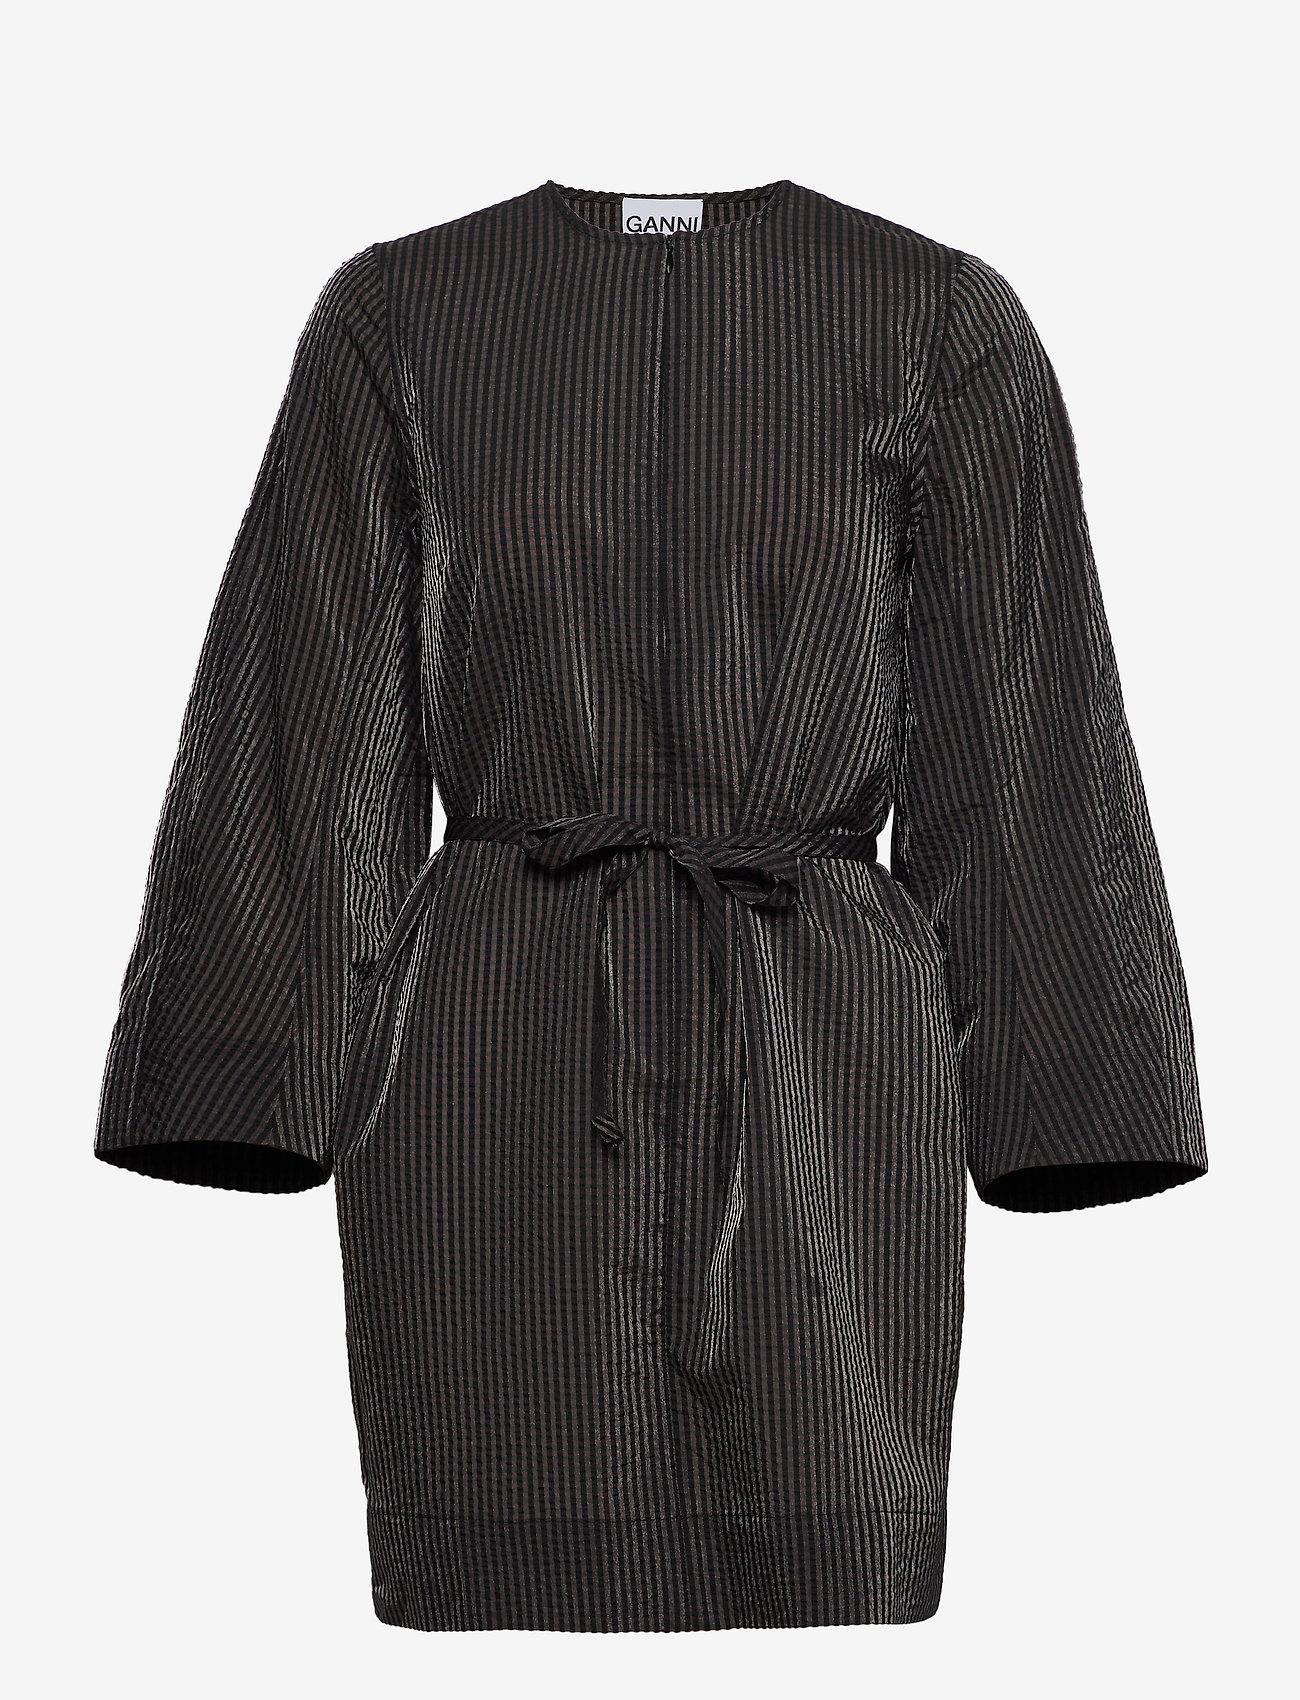 Ganni - Seersucker Check - summer dresses - black - 2